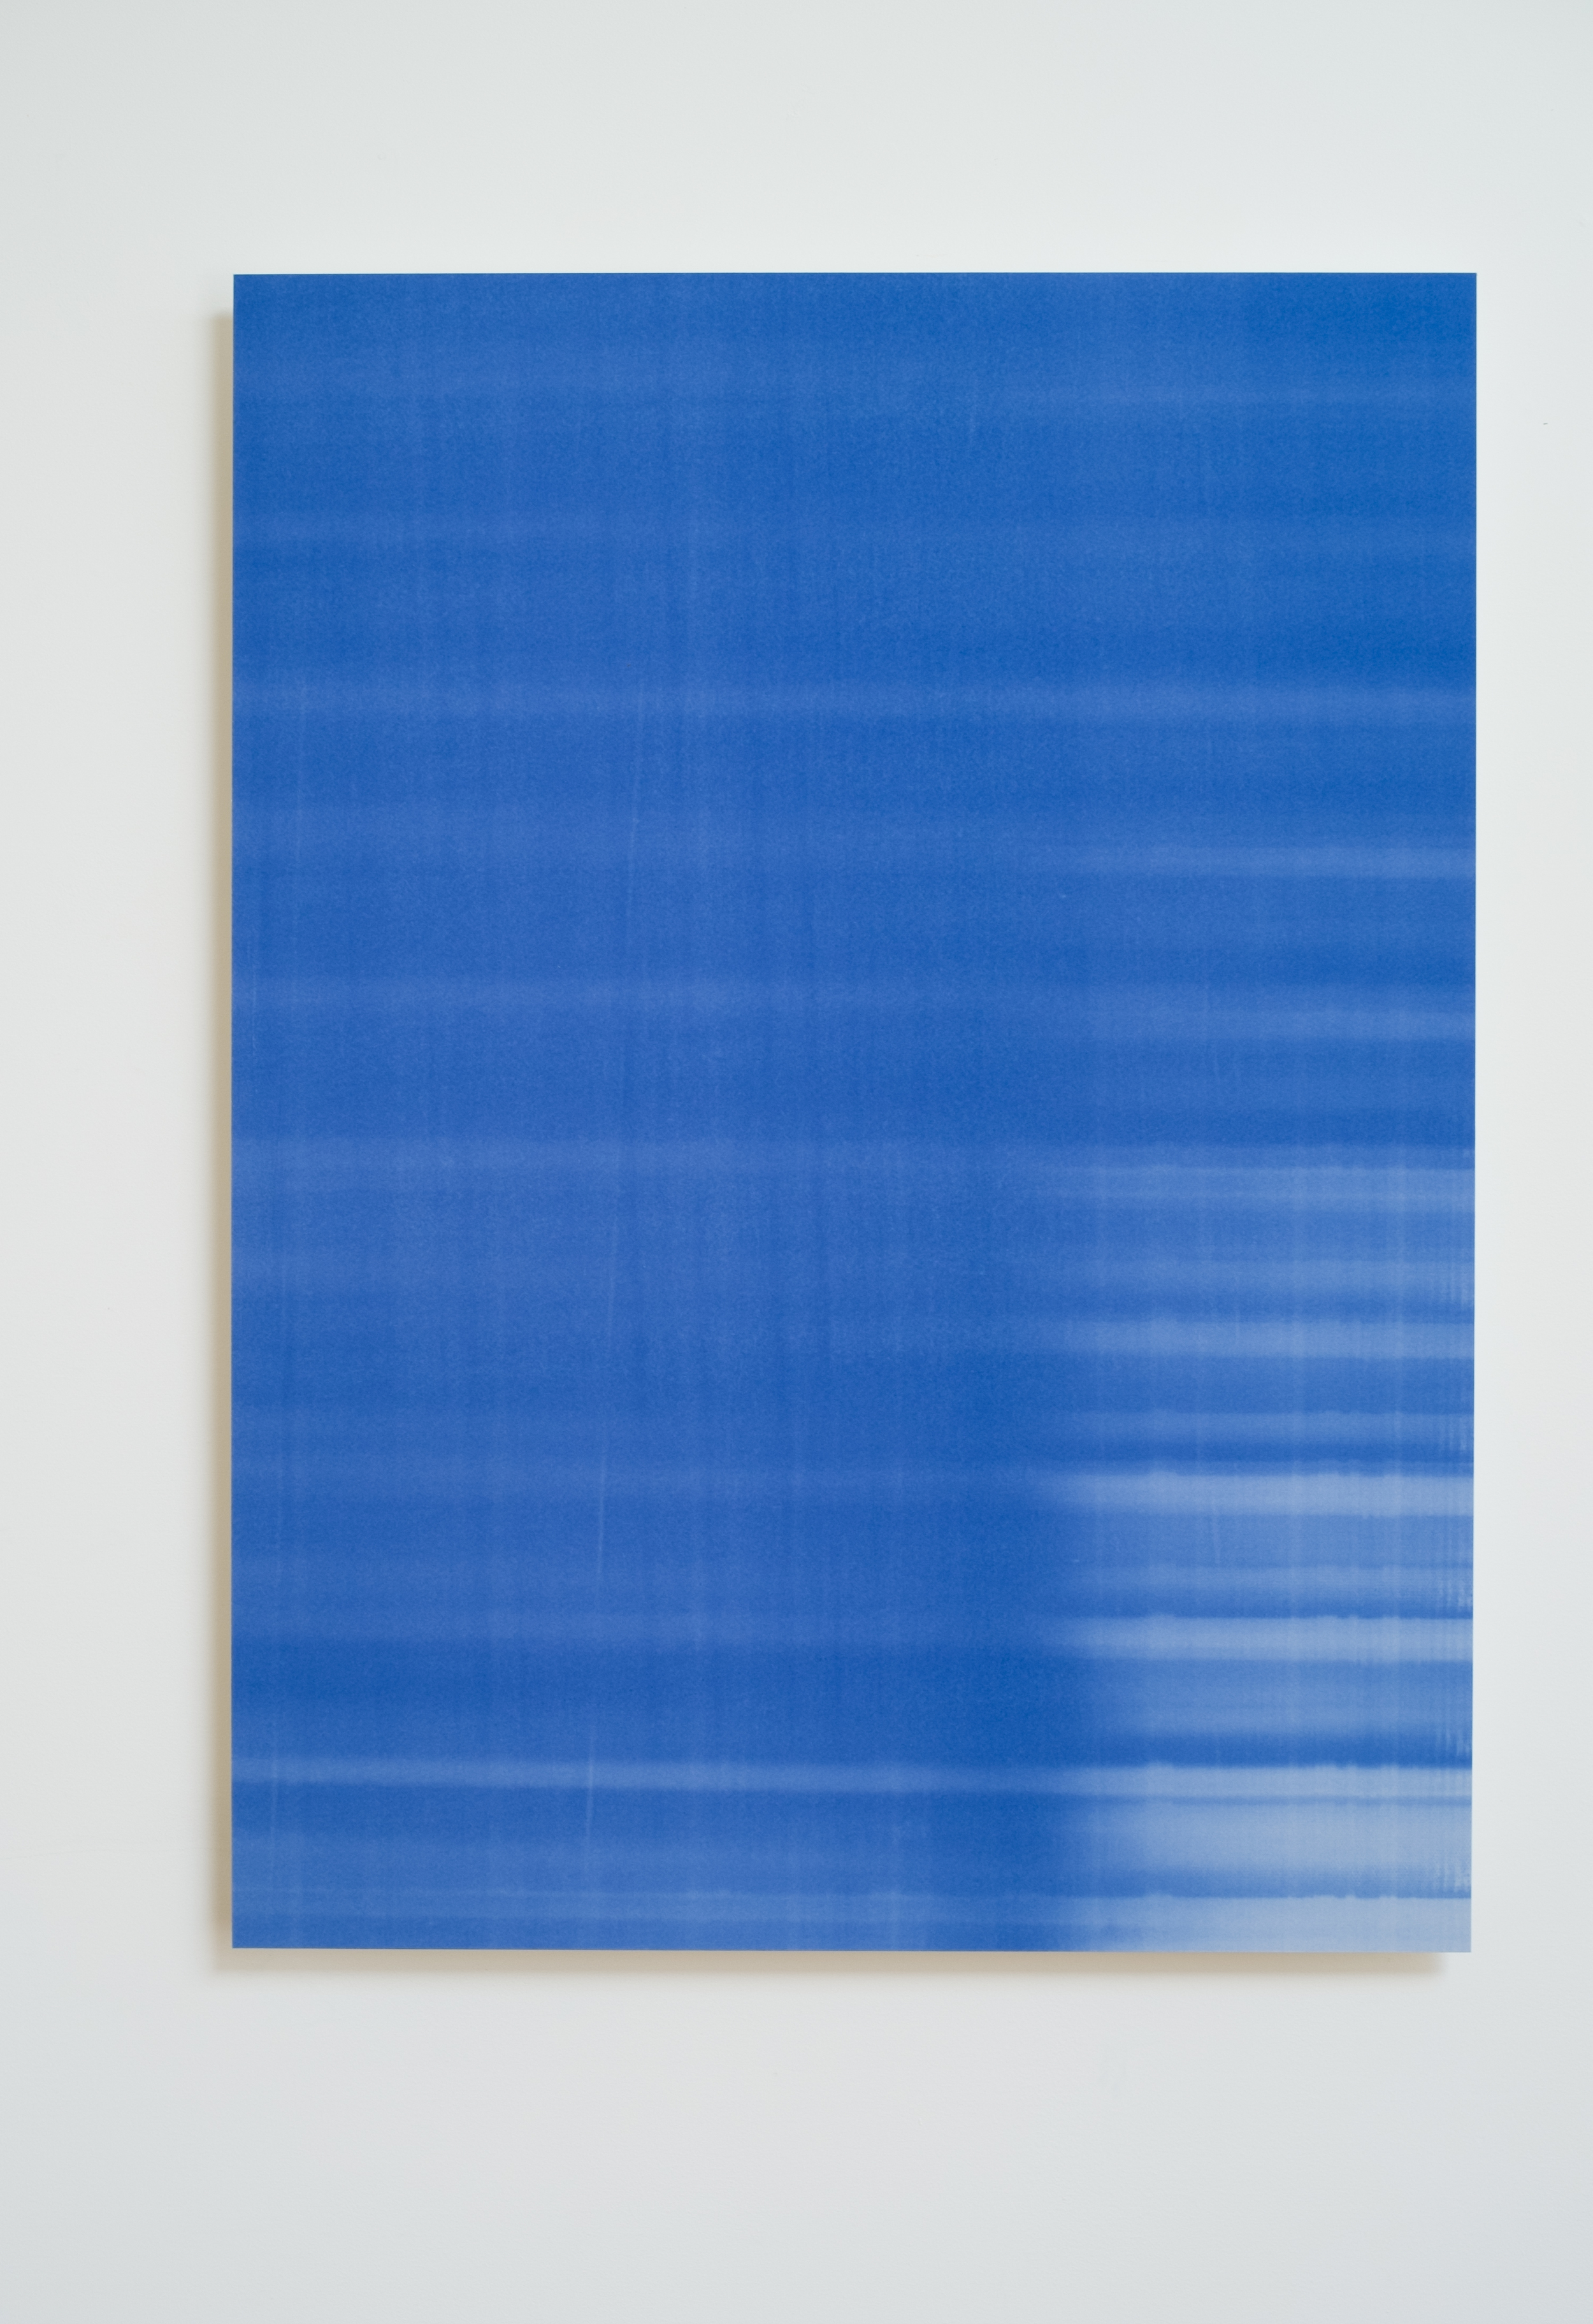 Luca Antonucci,   Blue Print,   2015.      32 ¾ x 44 in.     Blueprint